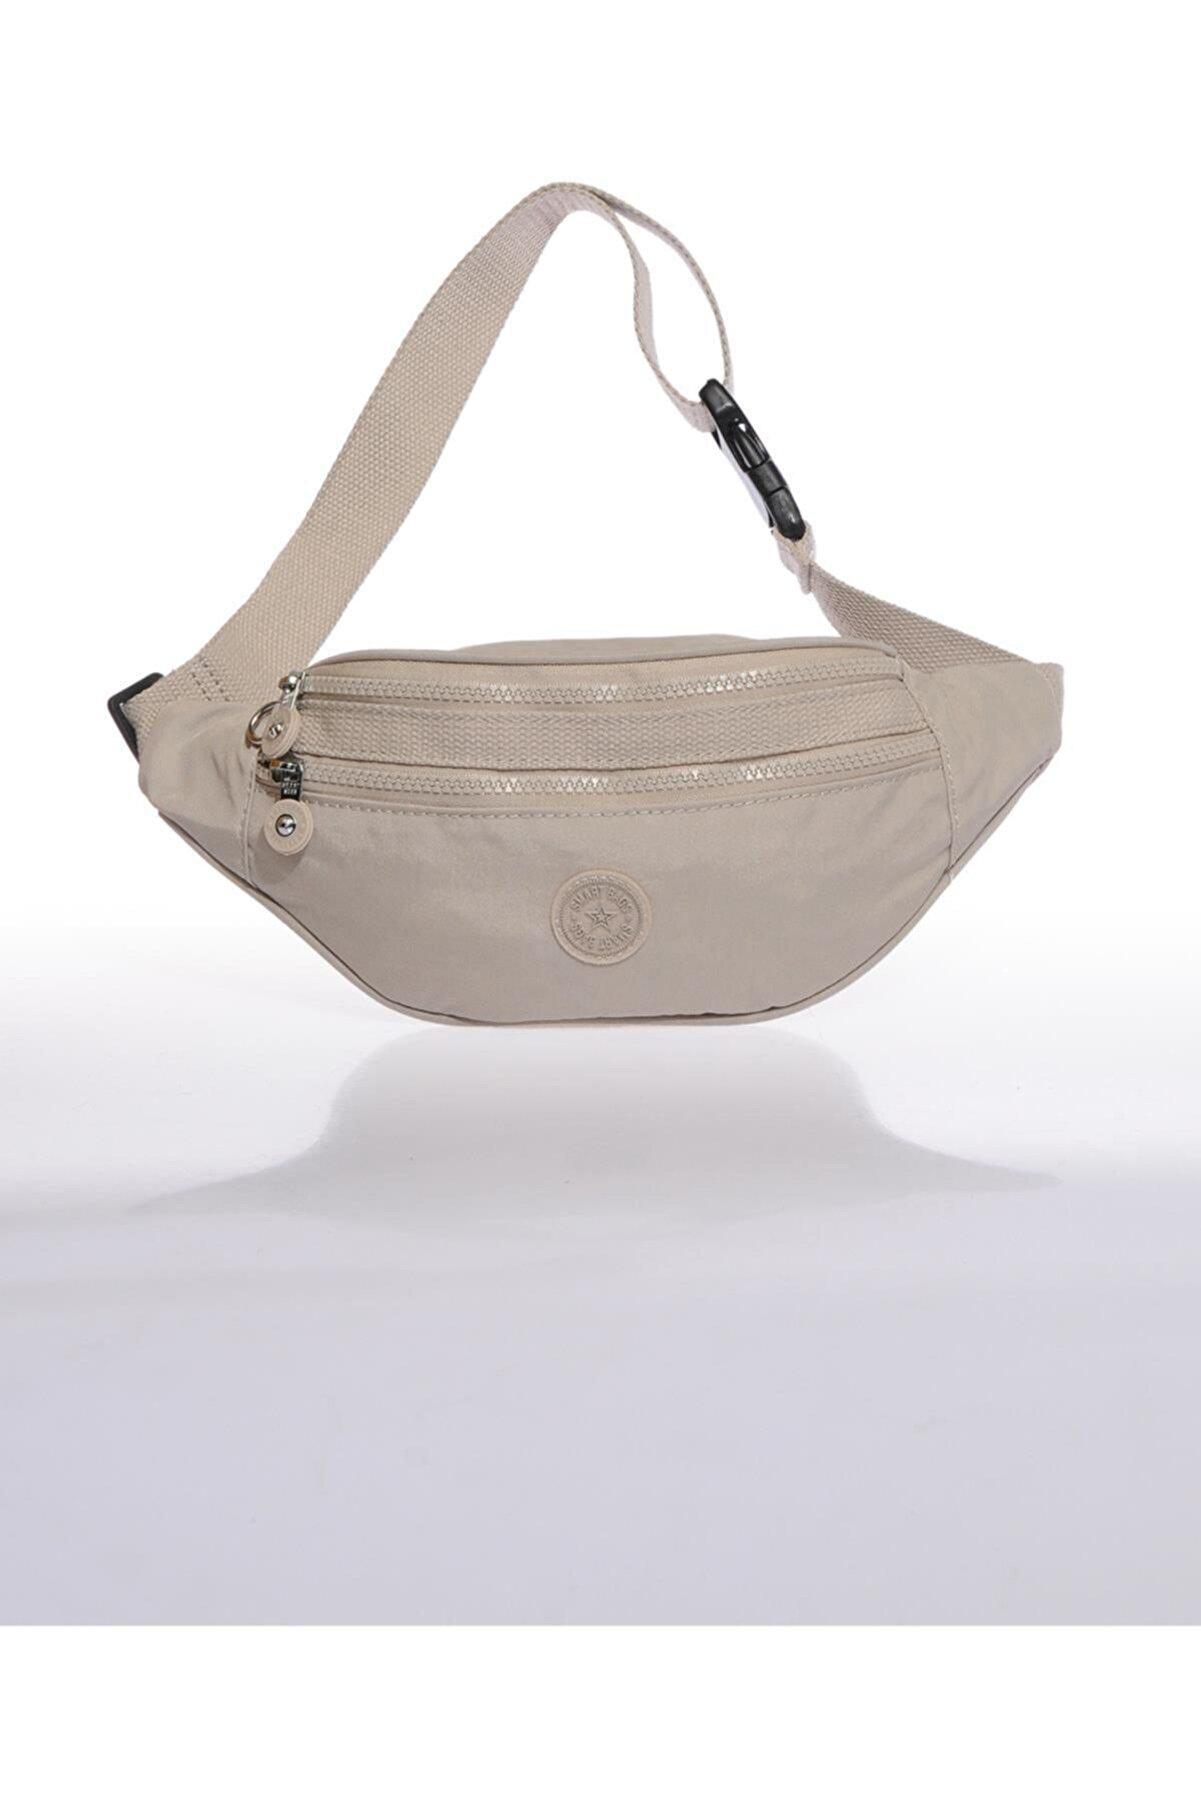 Smart Bags Bej Kadın  Bel Çantası Smb3030